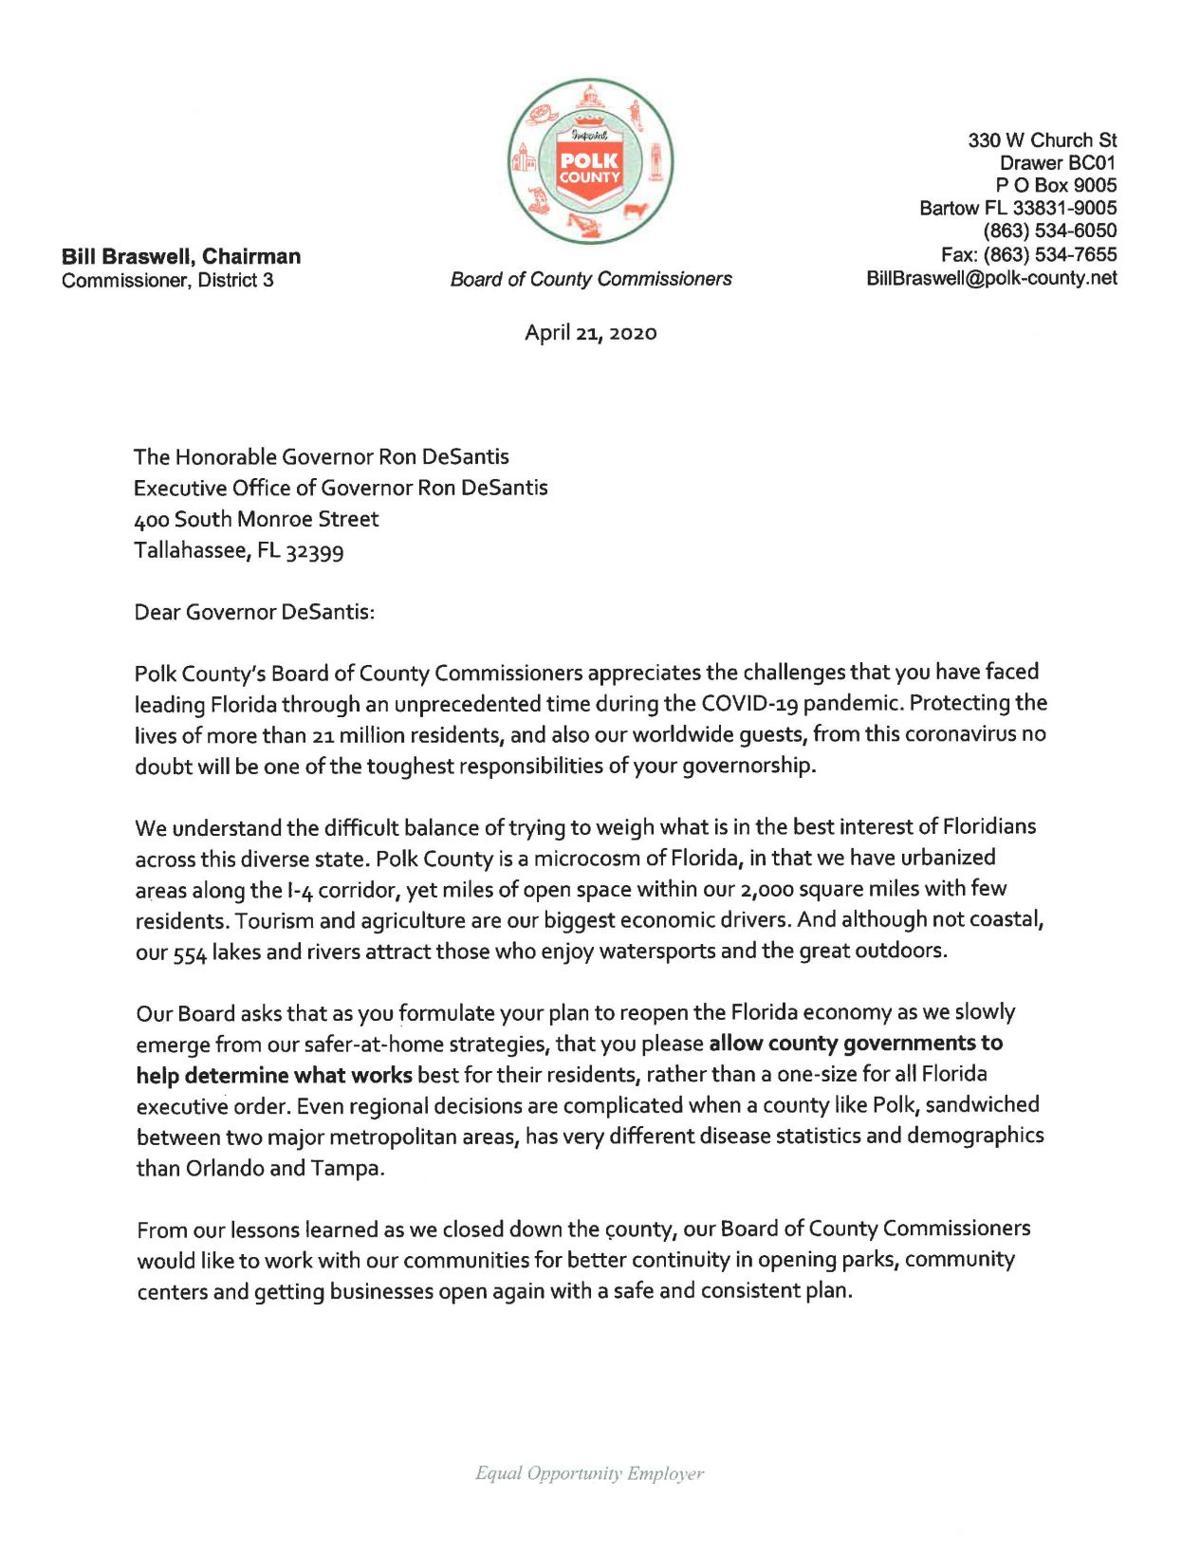 Polk BoCC Letter_Page_1.jpg